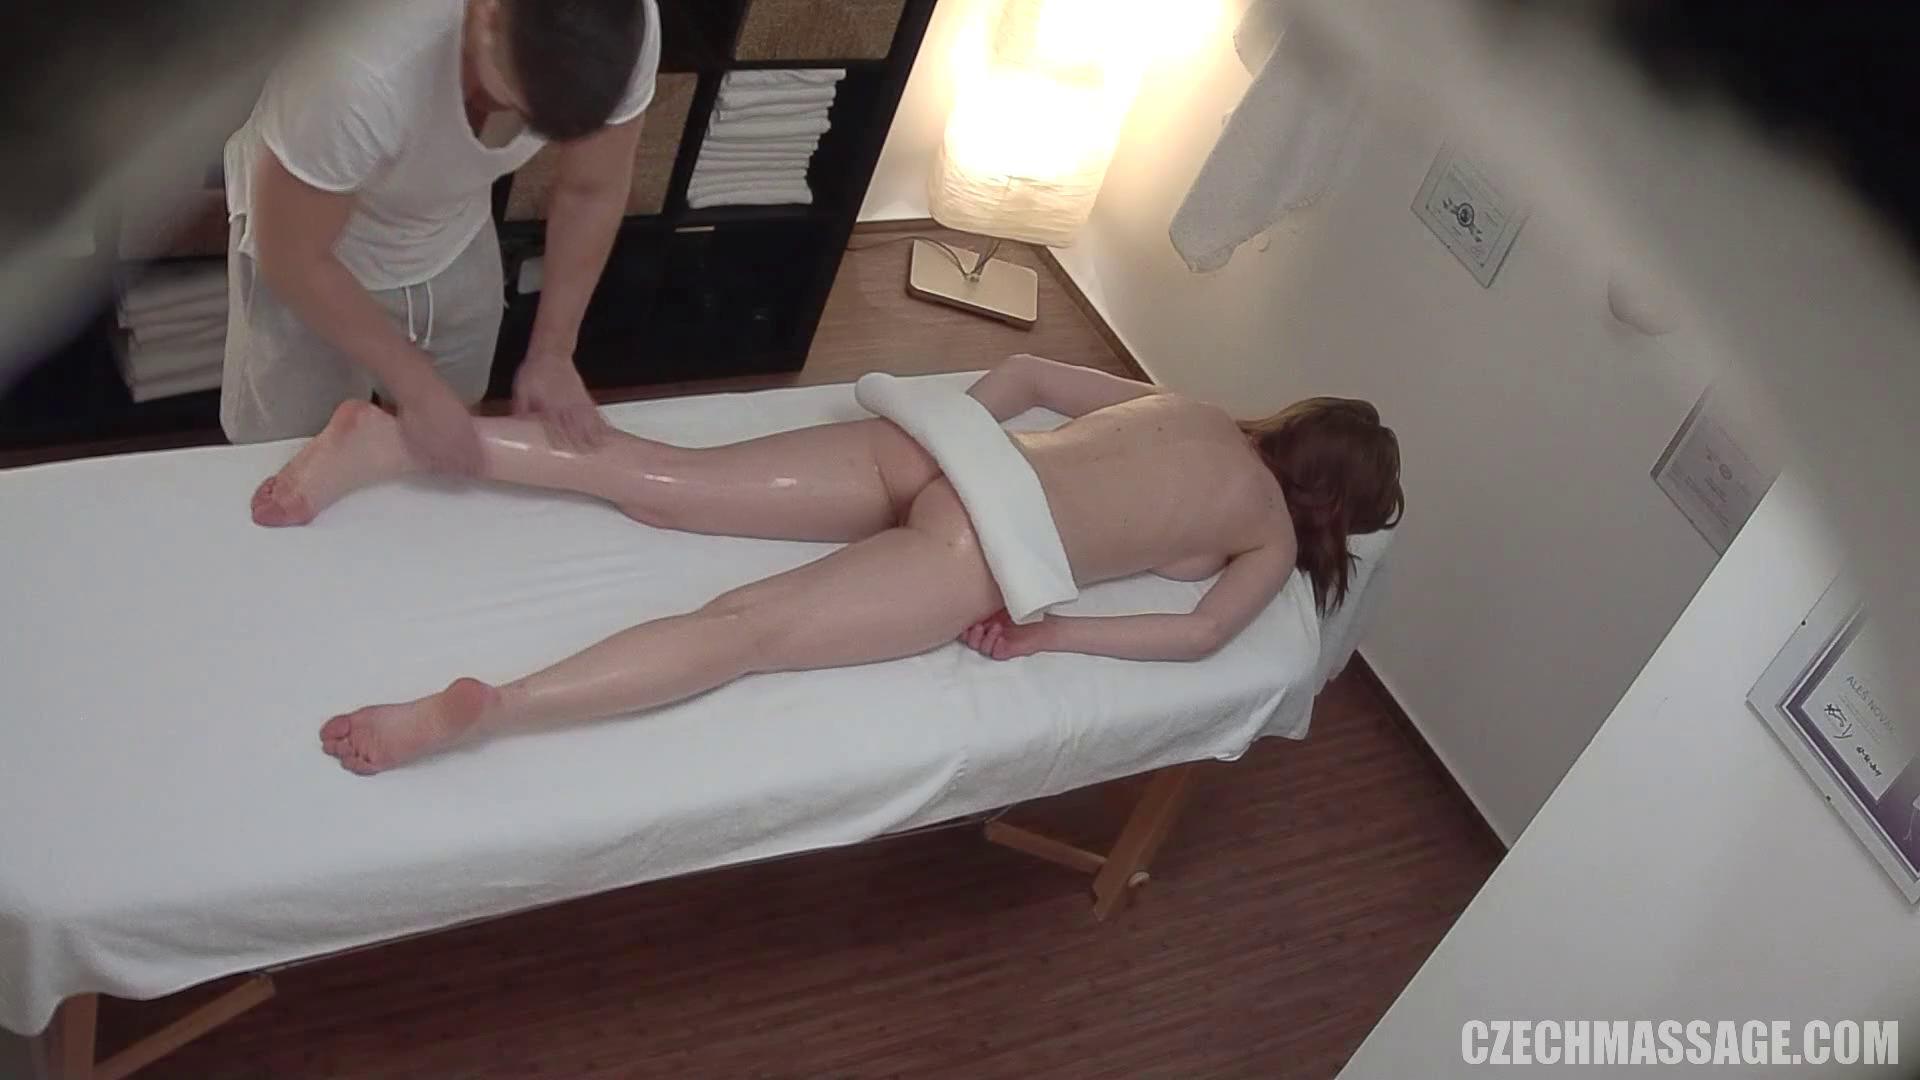 CzechMassage – Massage 348